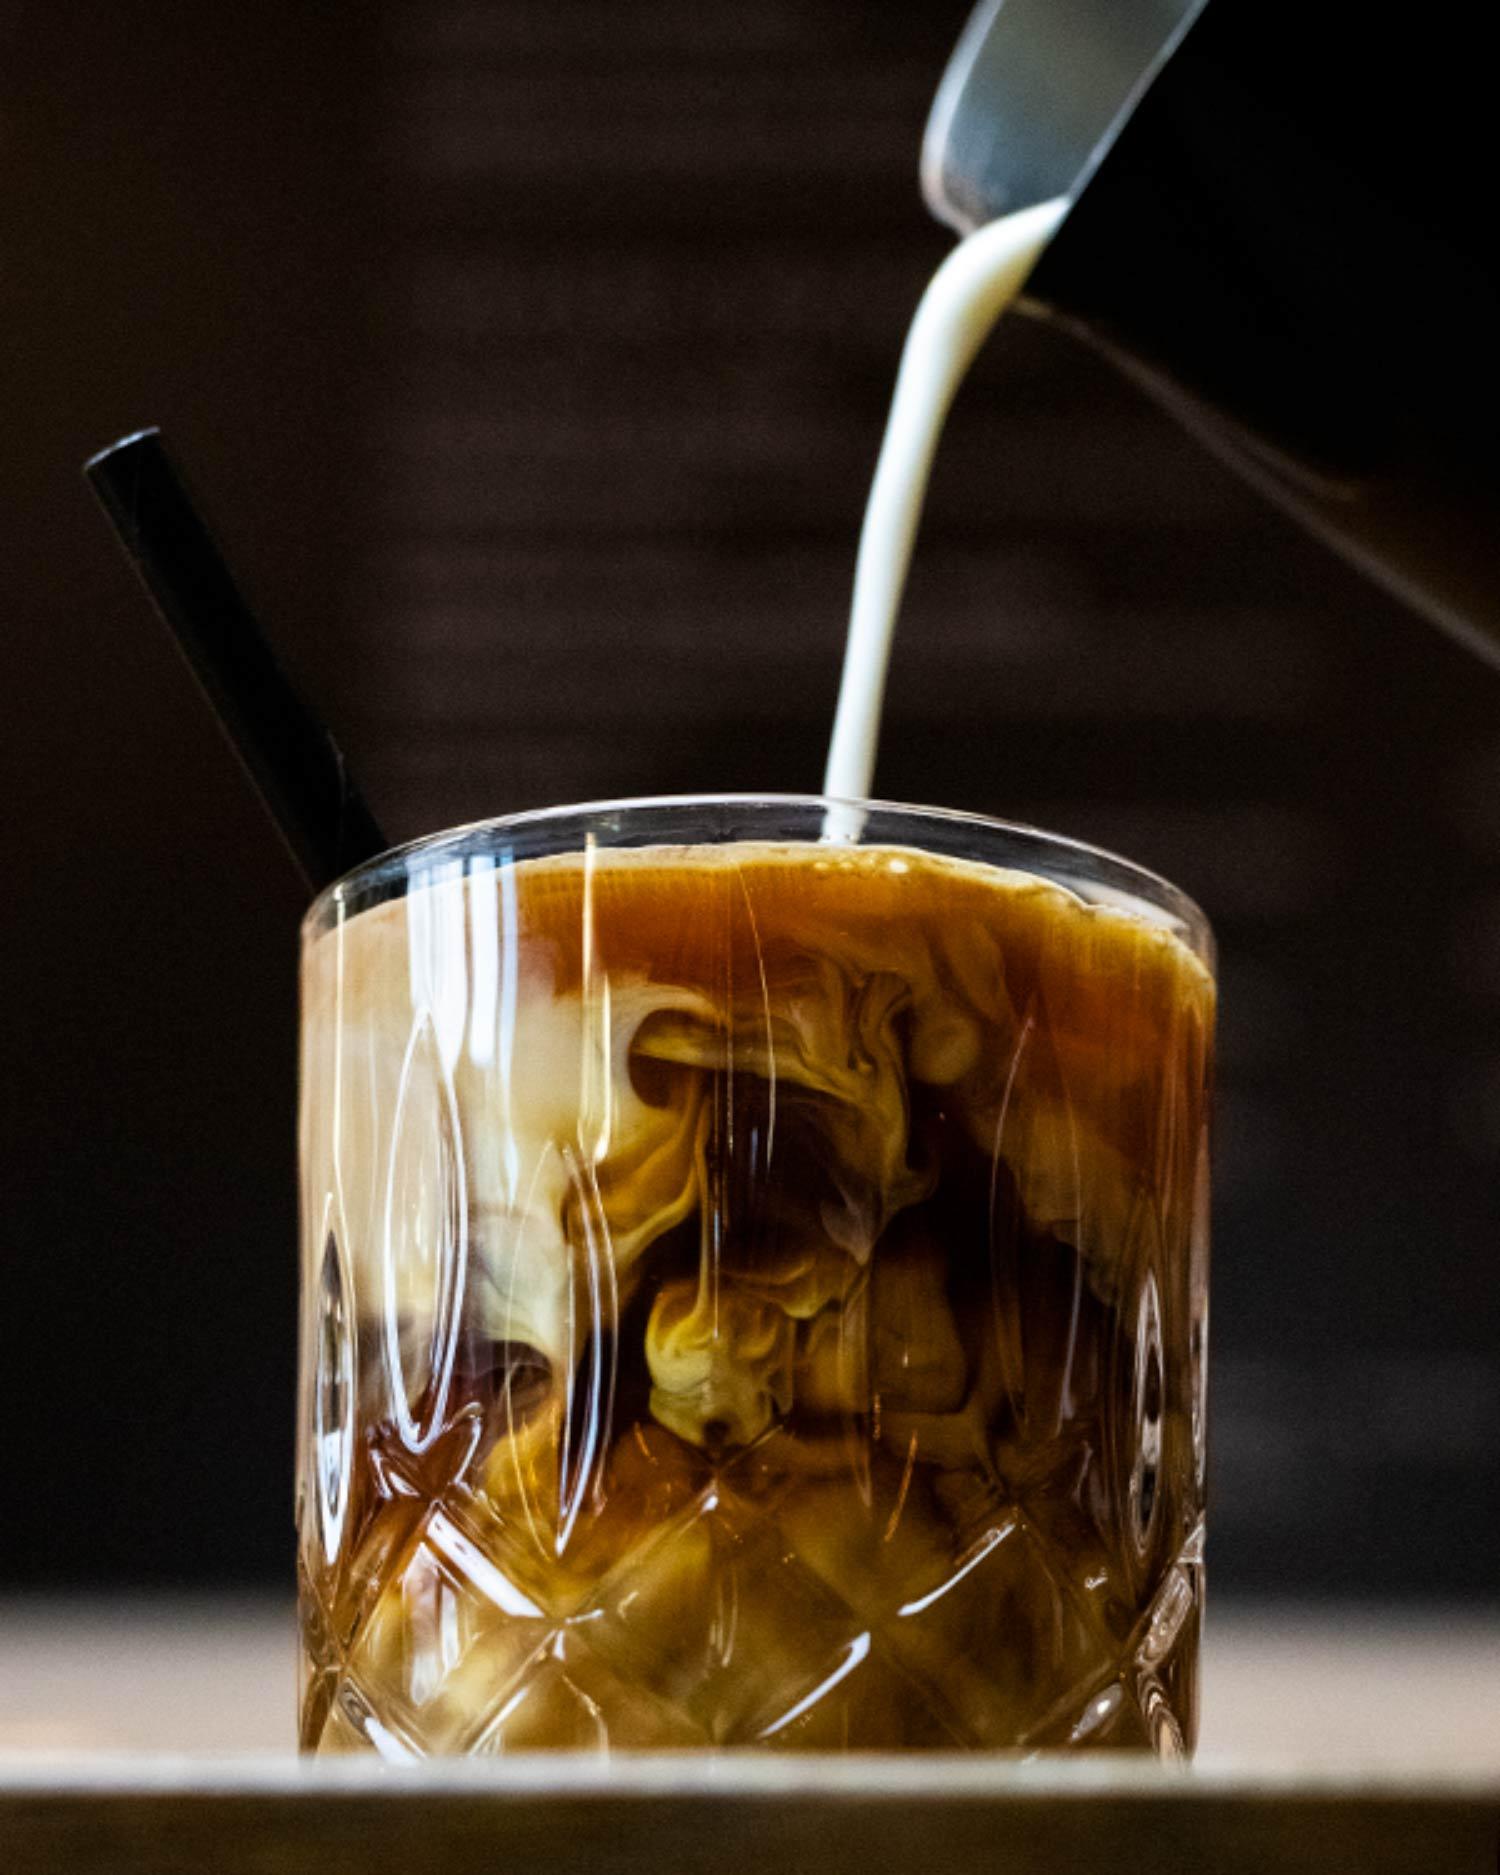 Eiskaffee-v